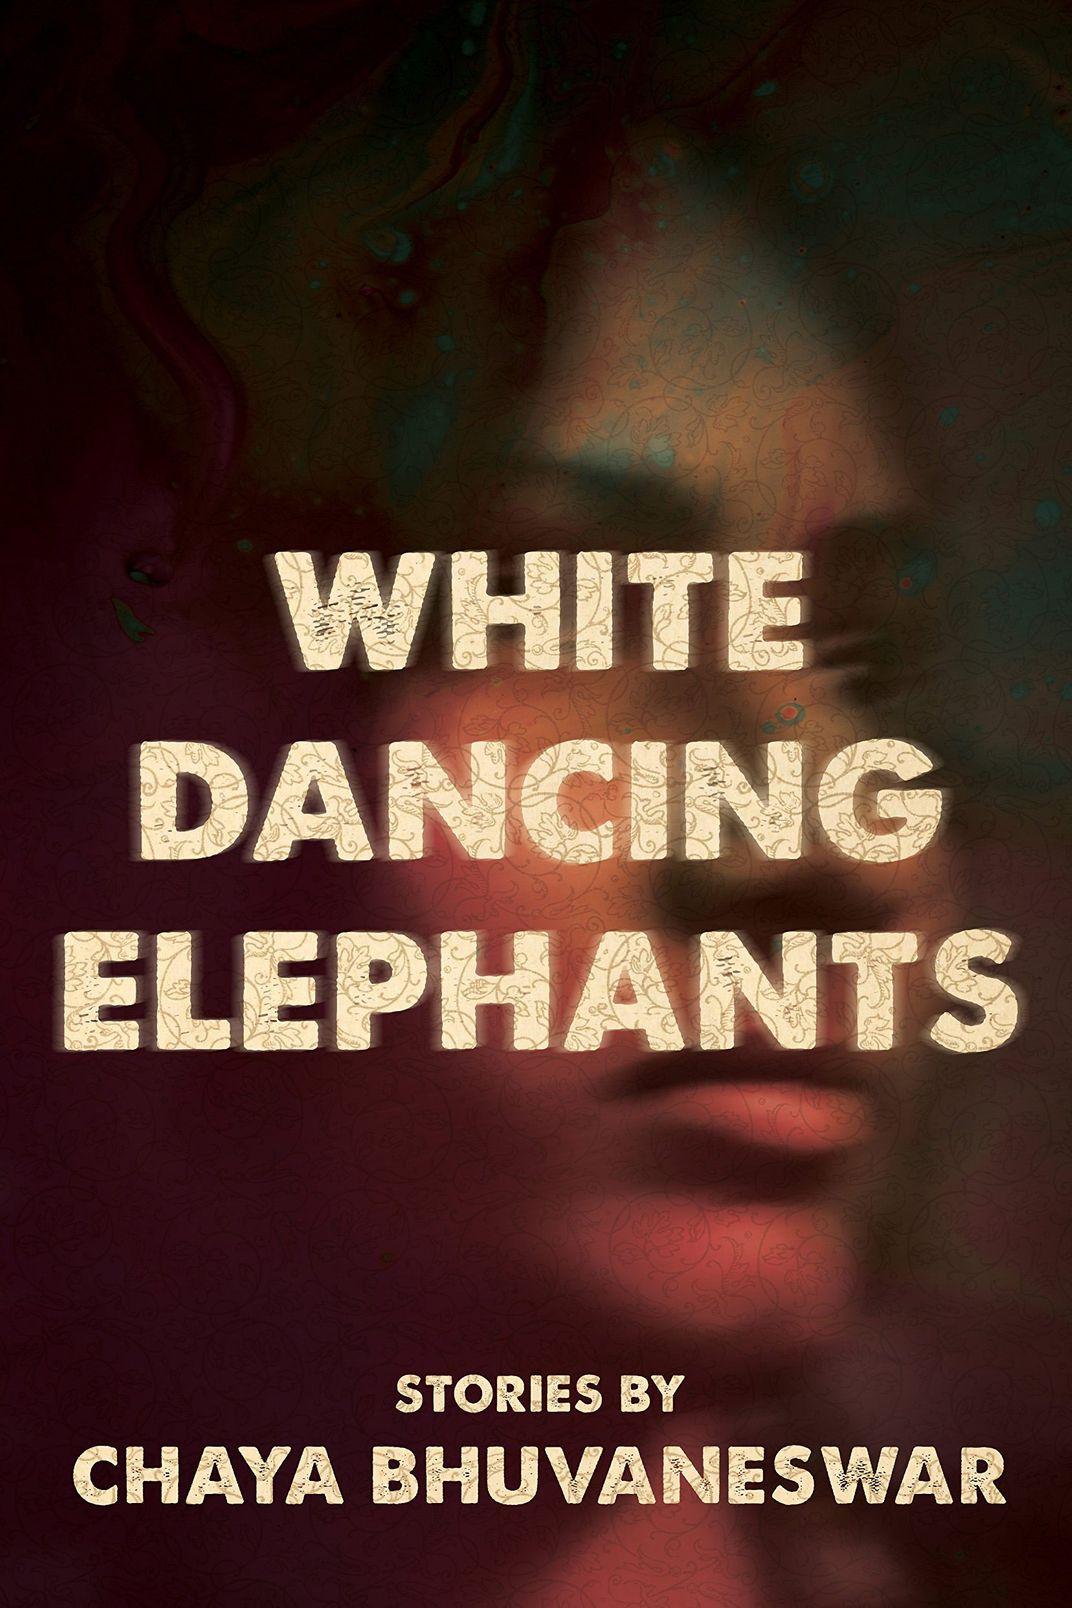 <em>White Dancing Elephants</em>, by Chaya Bhuvaneswar